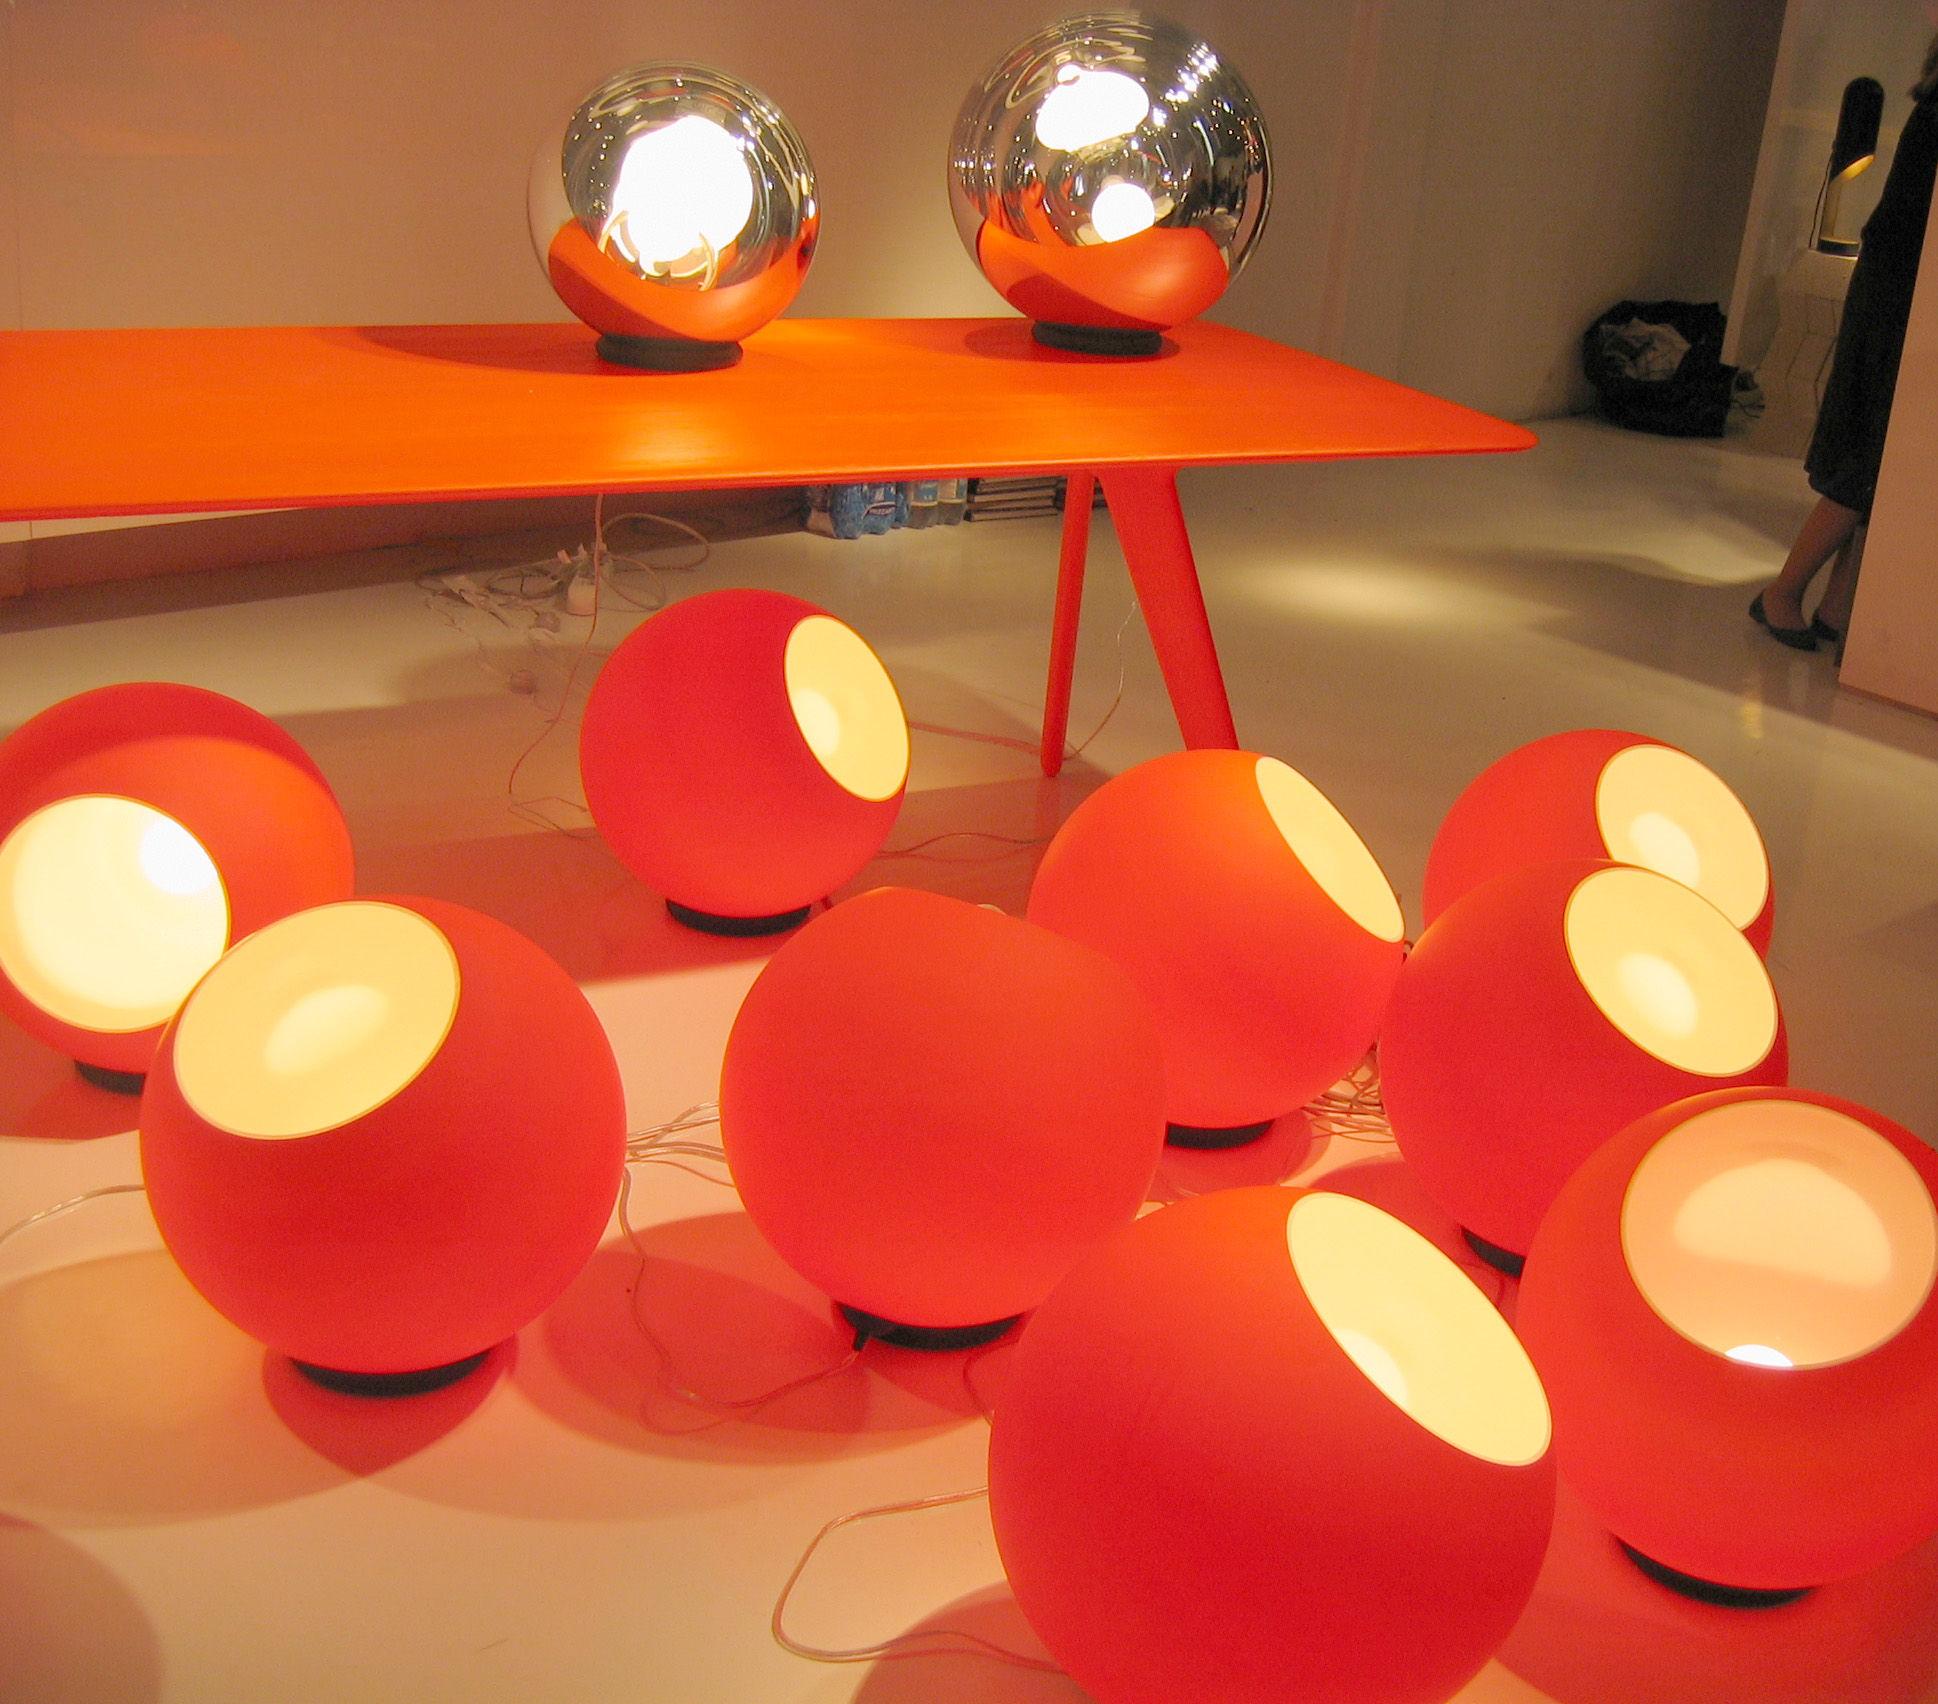 Tom Dixon Lampada Fluoro : Lampe de table fluoro orange fluo tom dixon made in design